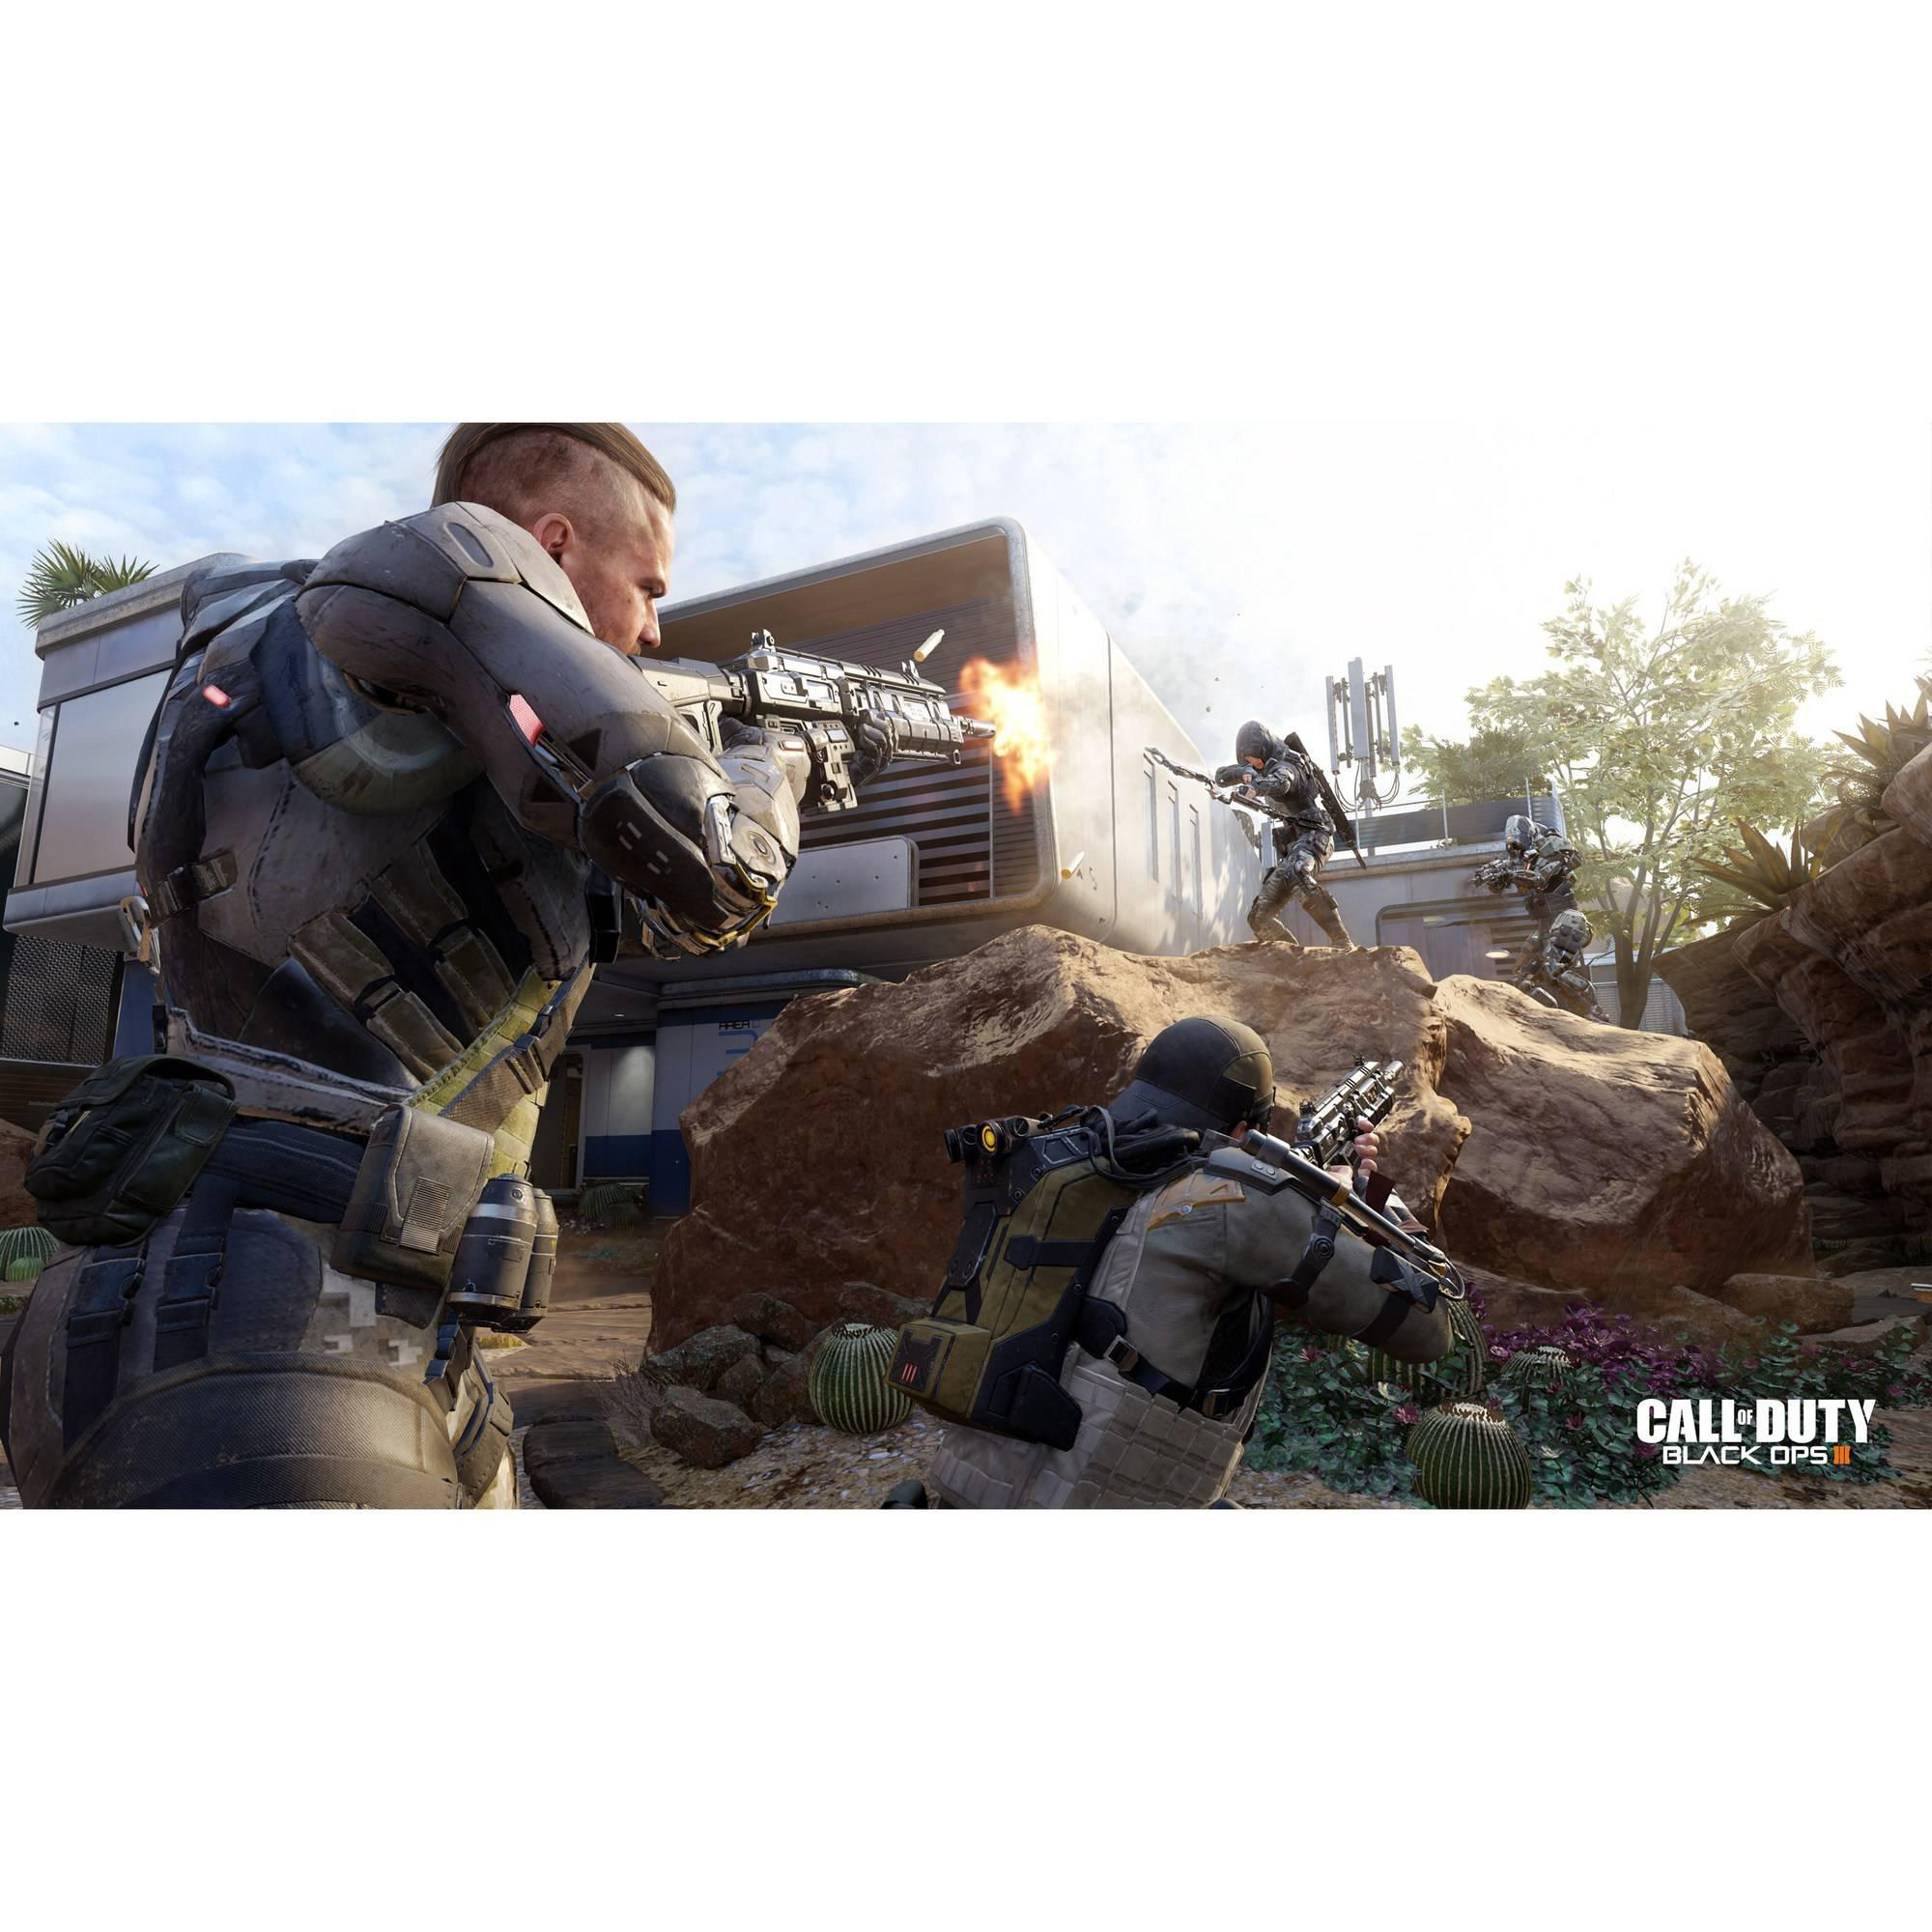 call of duty black ops iii (ps3) - walmart